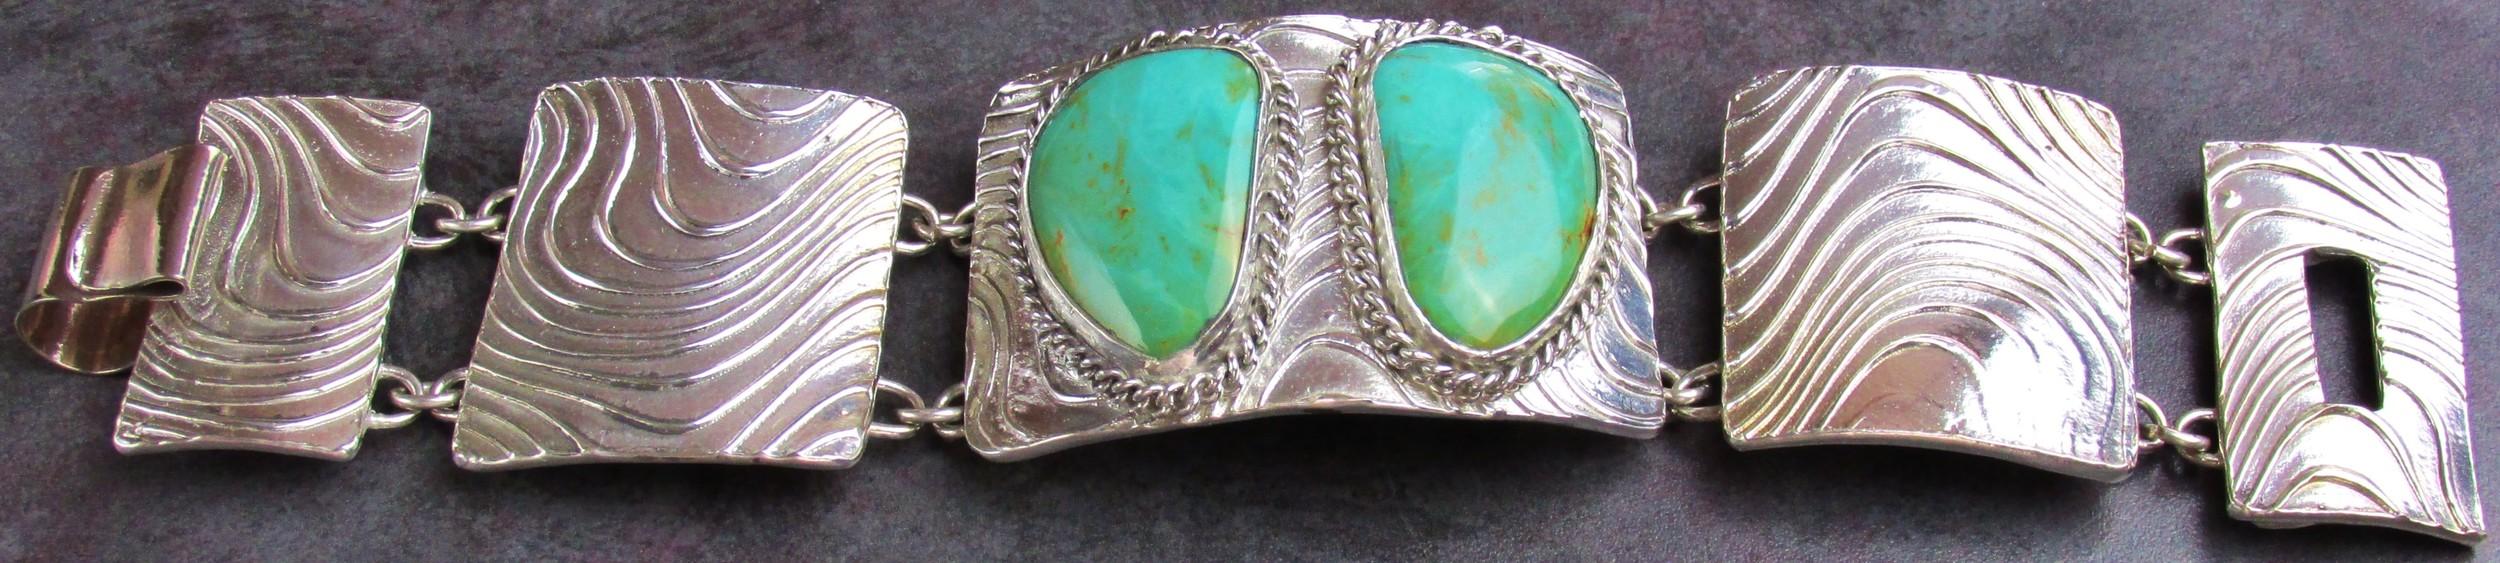 Jewelry by Wendy Lea